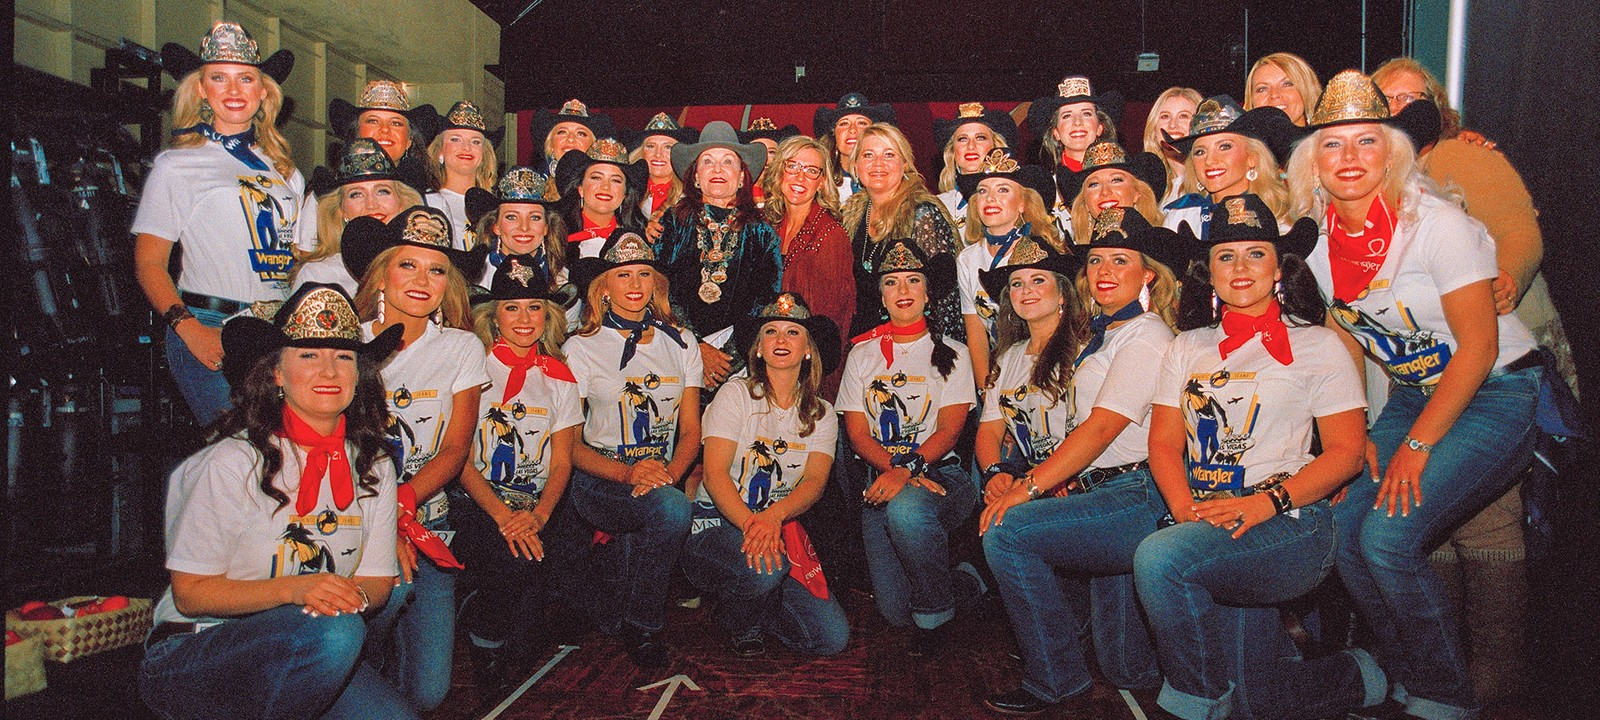 miss rodeo beauty pageant las vegas america usa diversity inclusivity